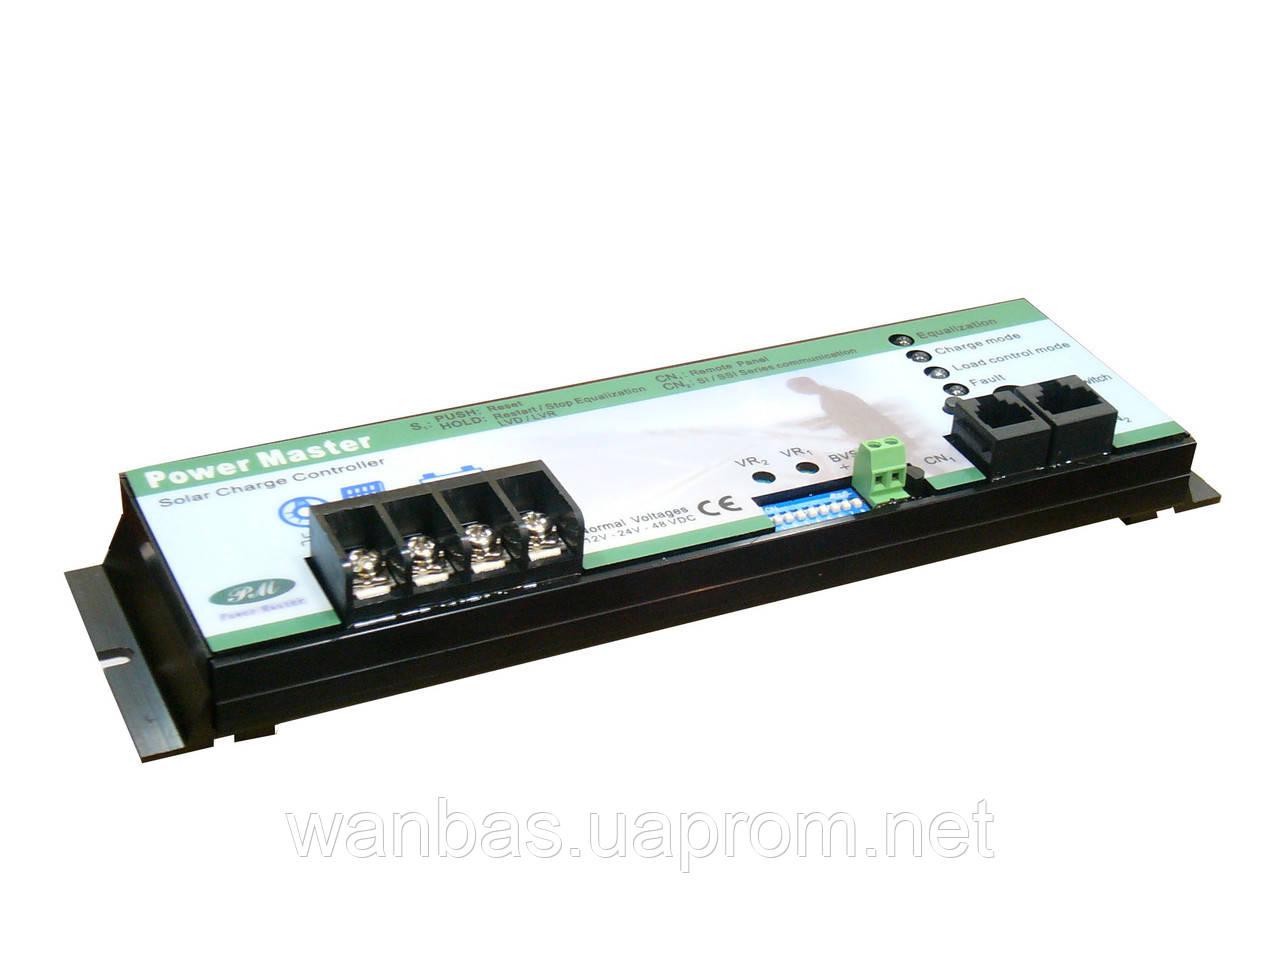 Контроллер заряда аккумуляторных батарей для солнечных модулей PM-SCC-30AP